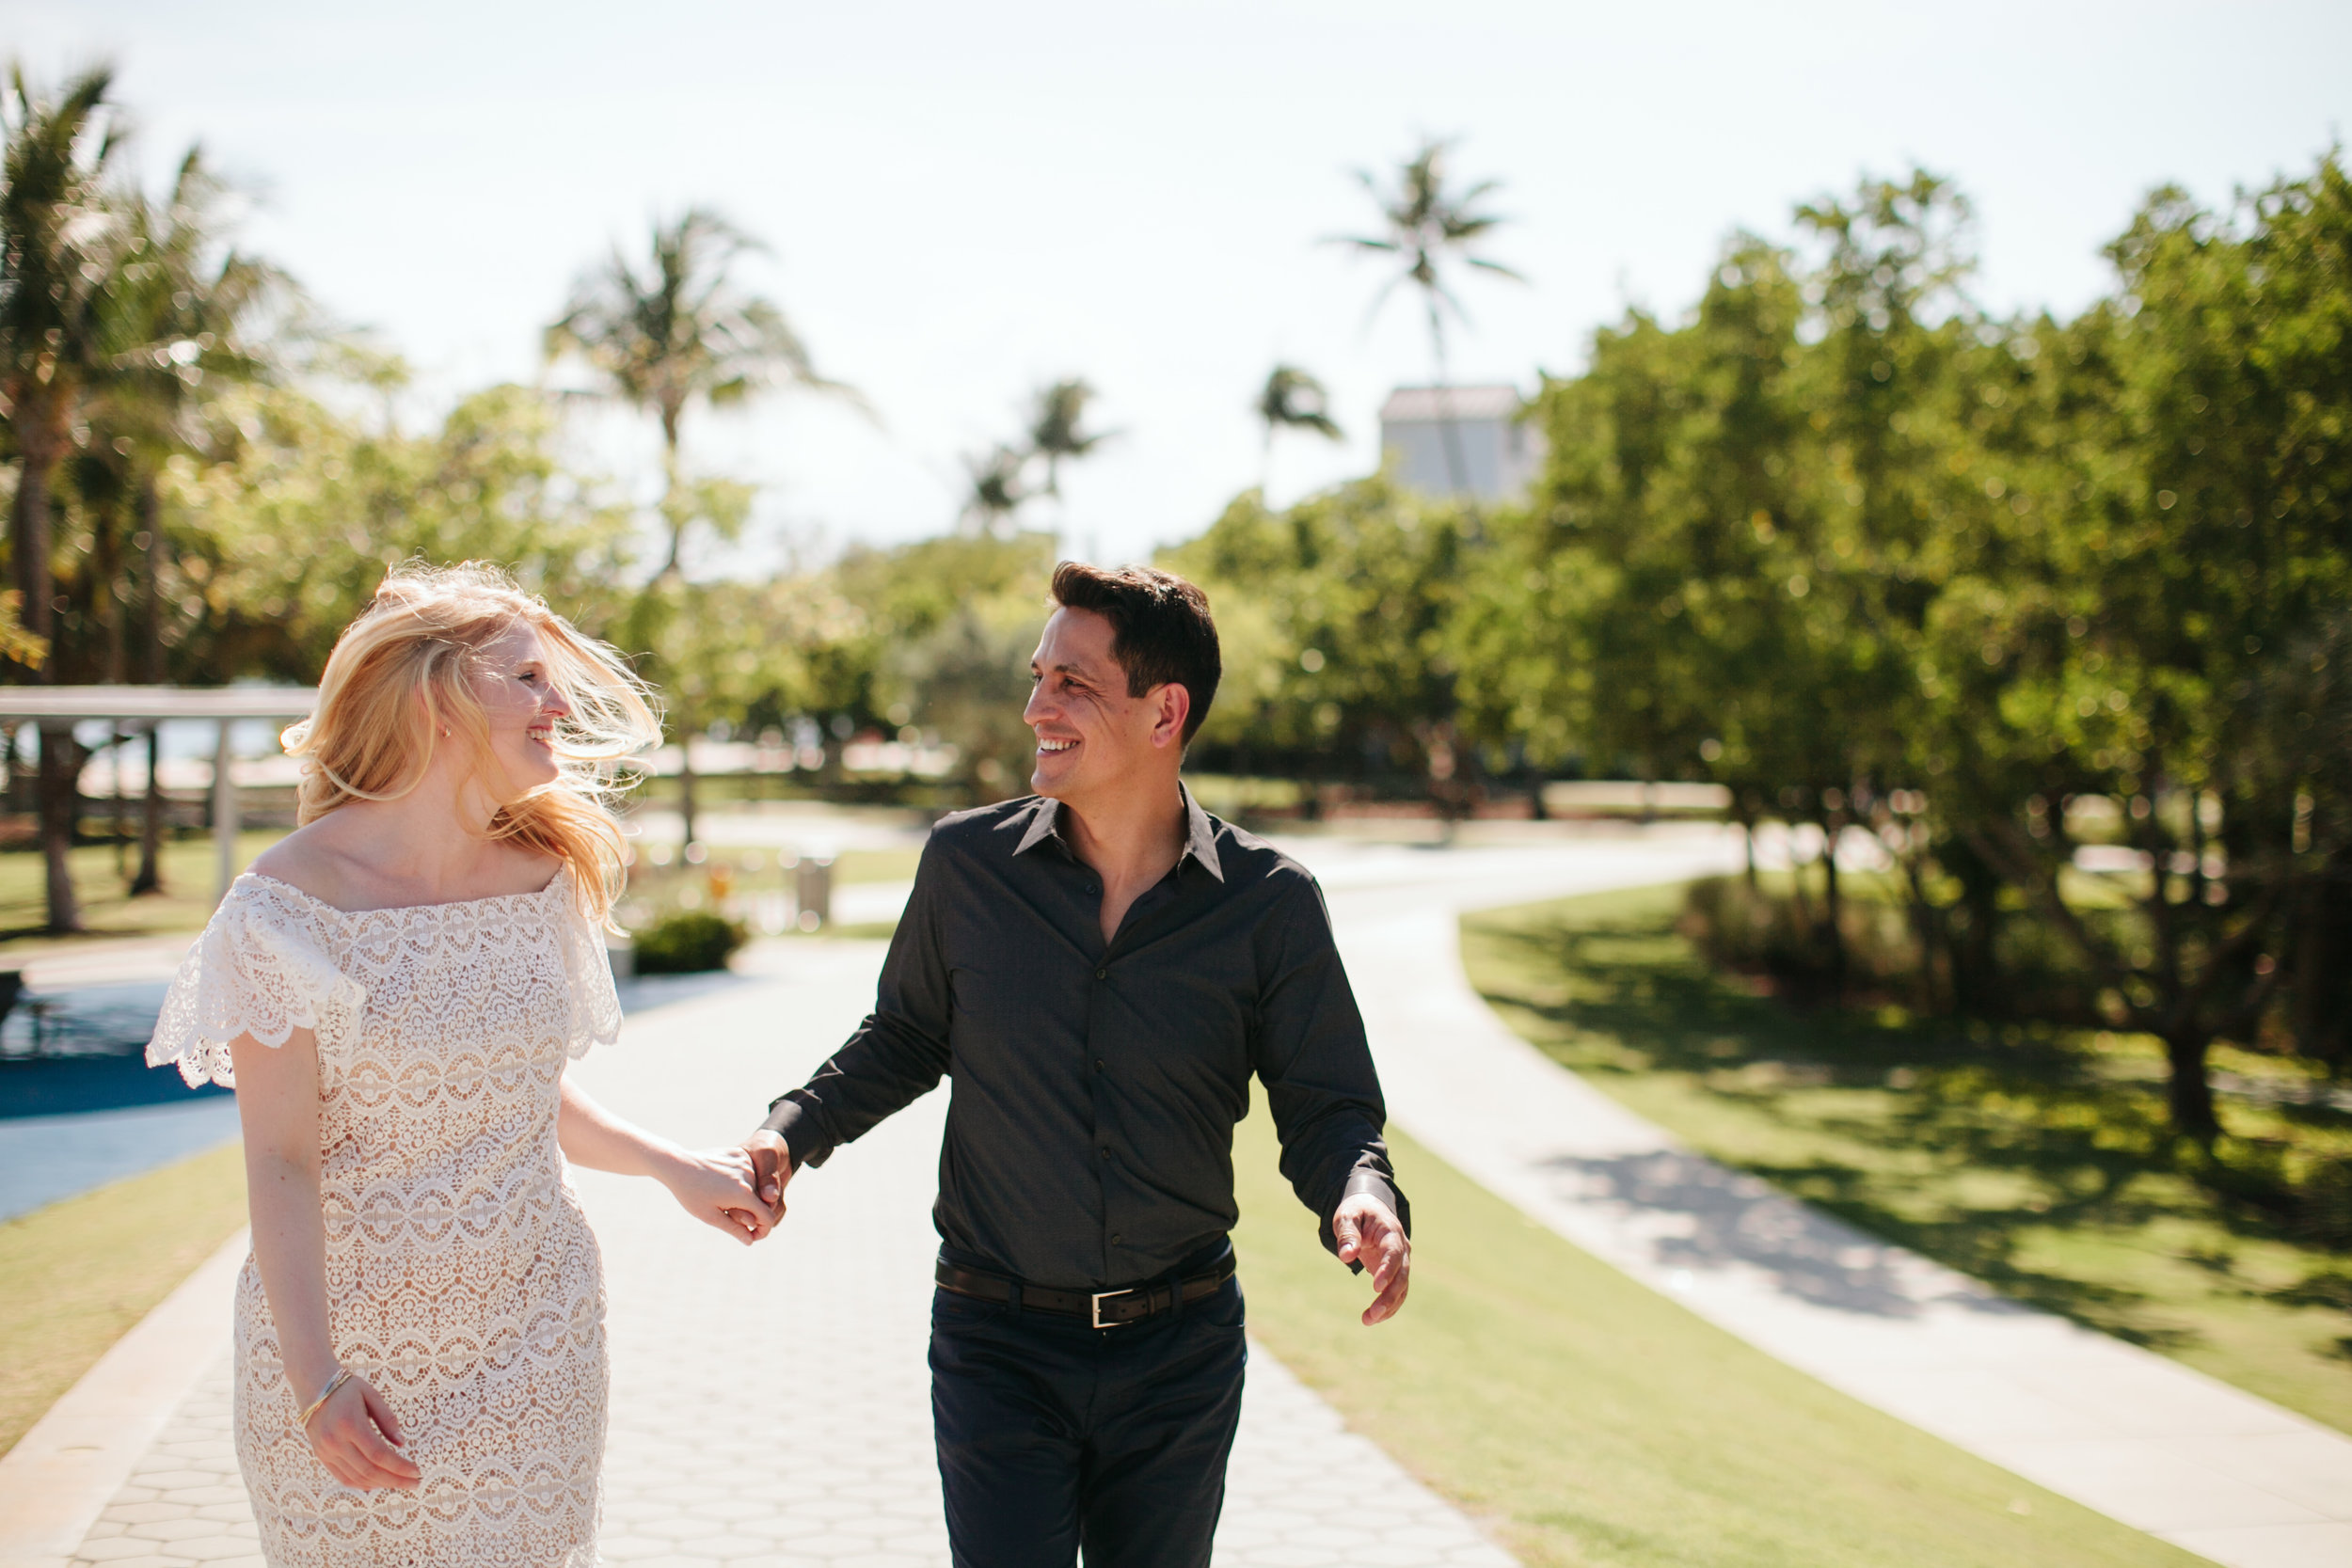 Miami Beach Engagement at South Pointe Park (5).jpg